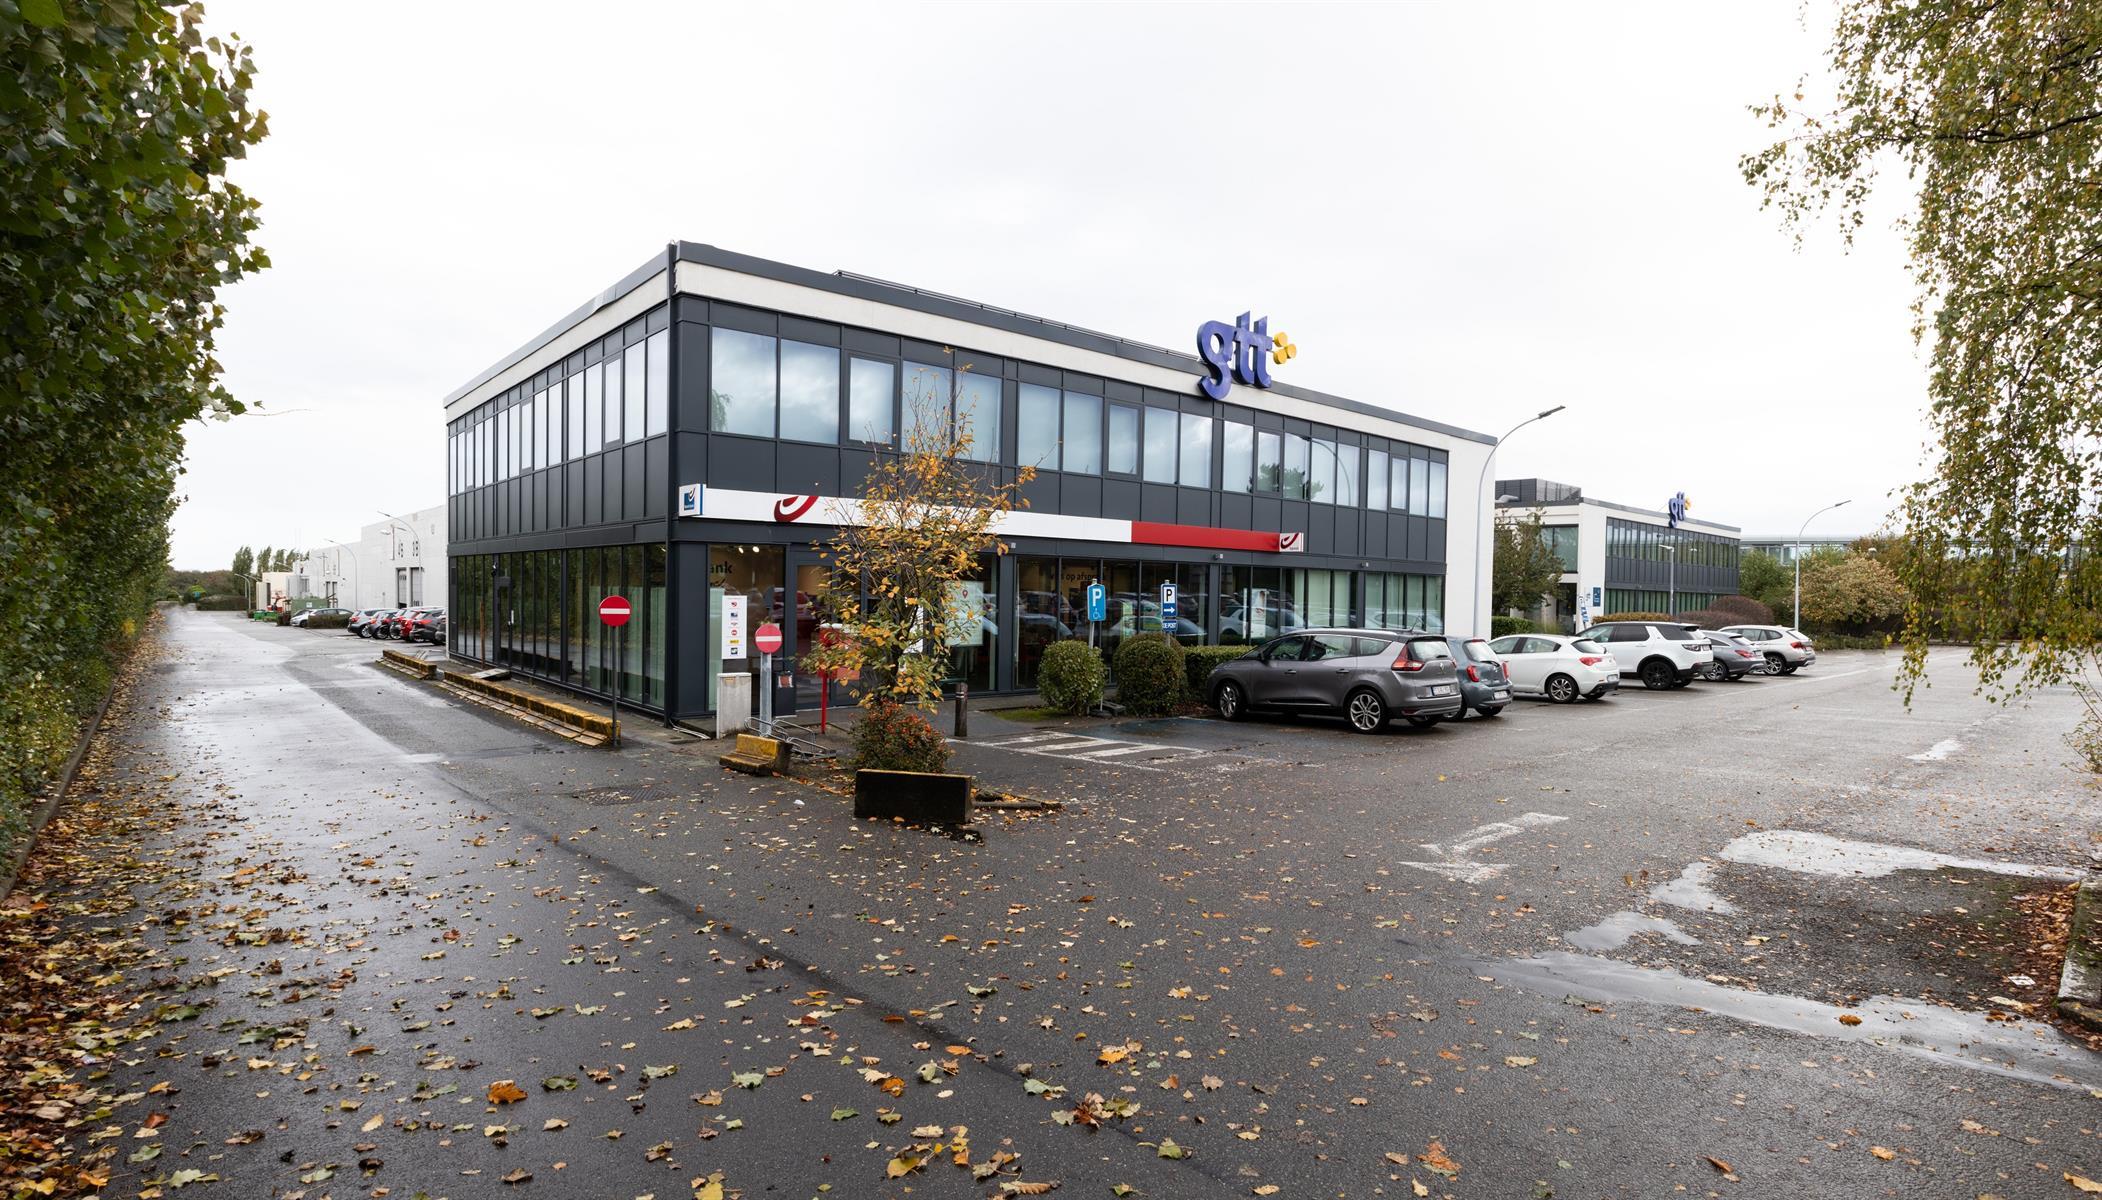 industrieel gebouw te huur I058 - Leuvensesteenweg 573, 1930 Zaventem, België 1